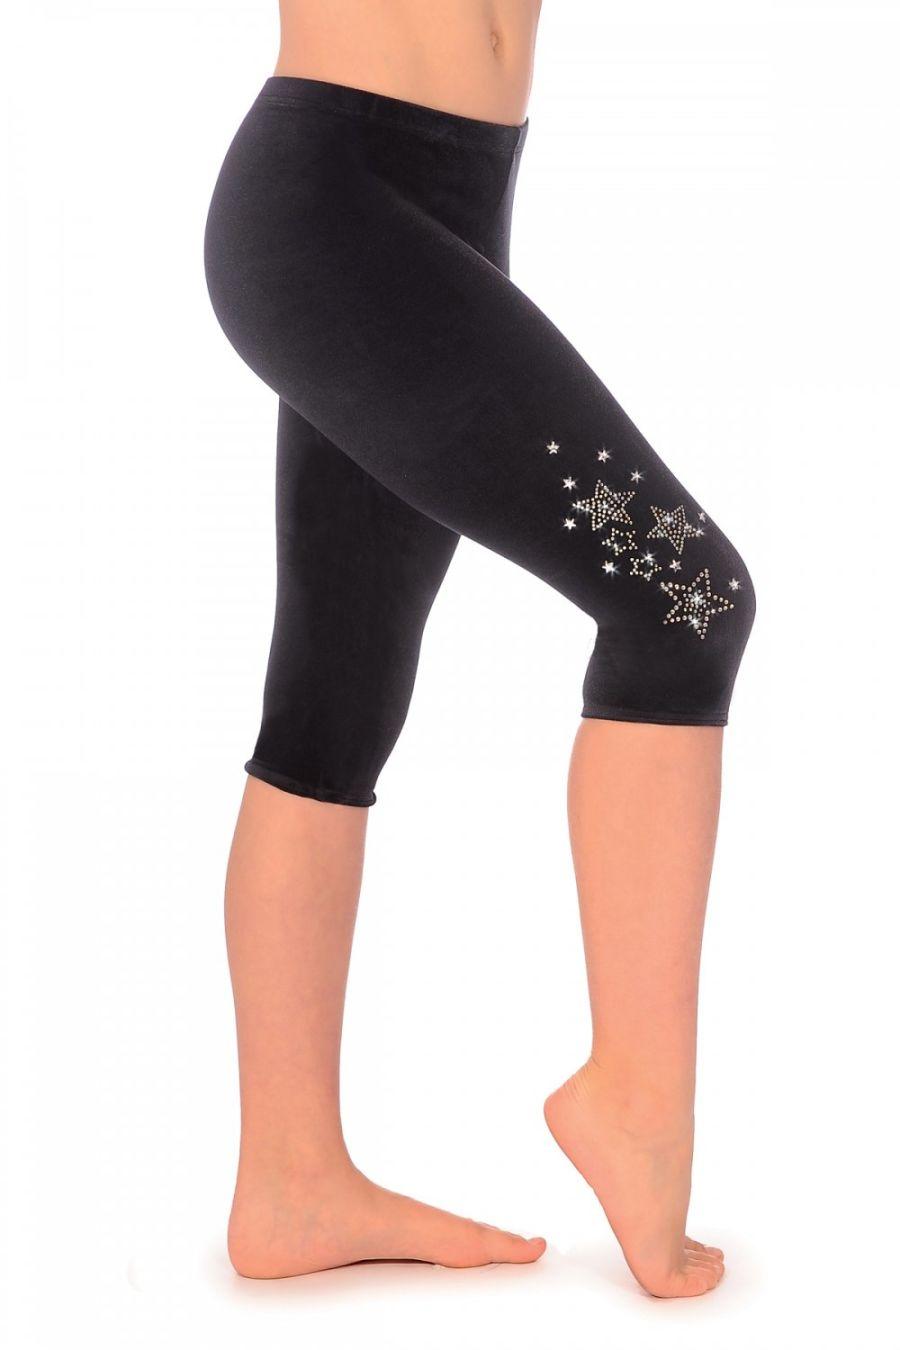 The Zone Dazzle Capri Smooth Velour leggings